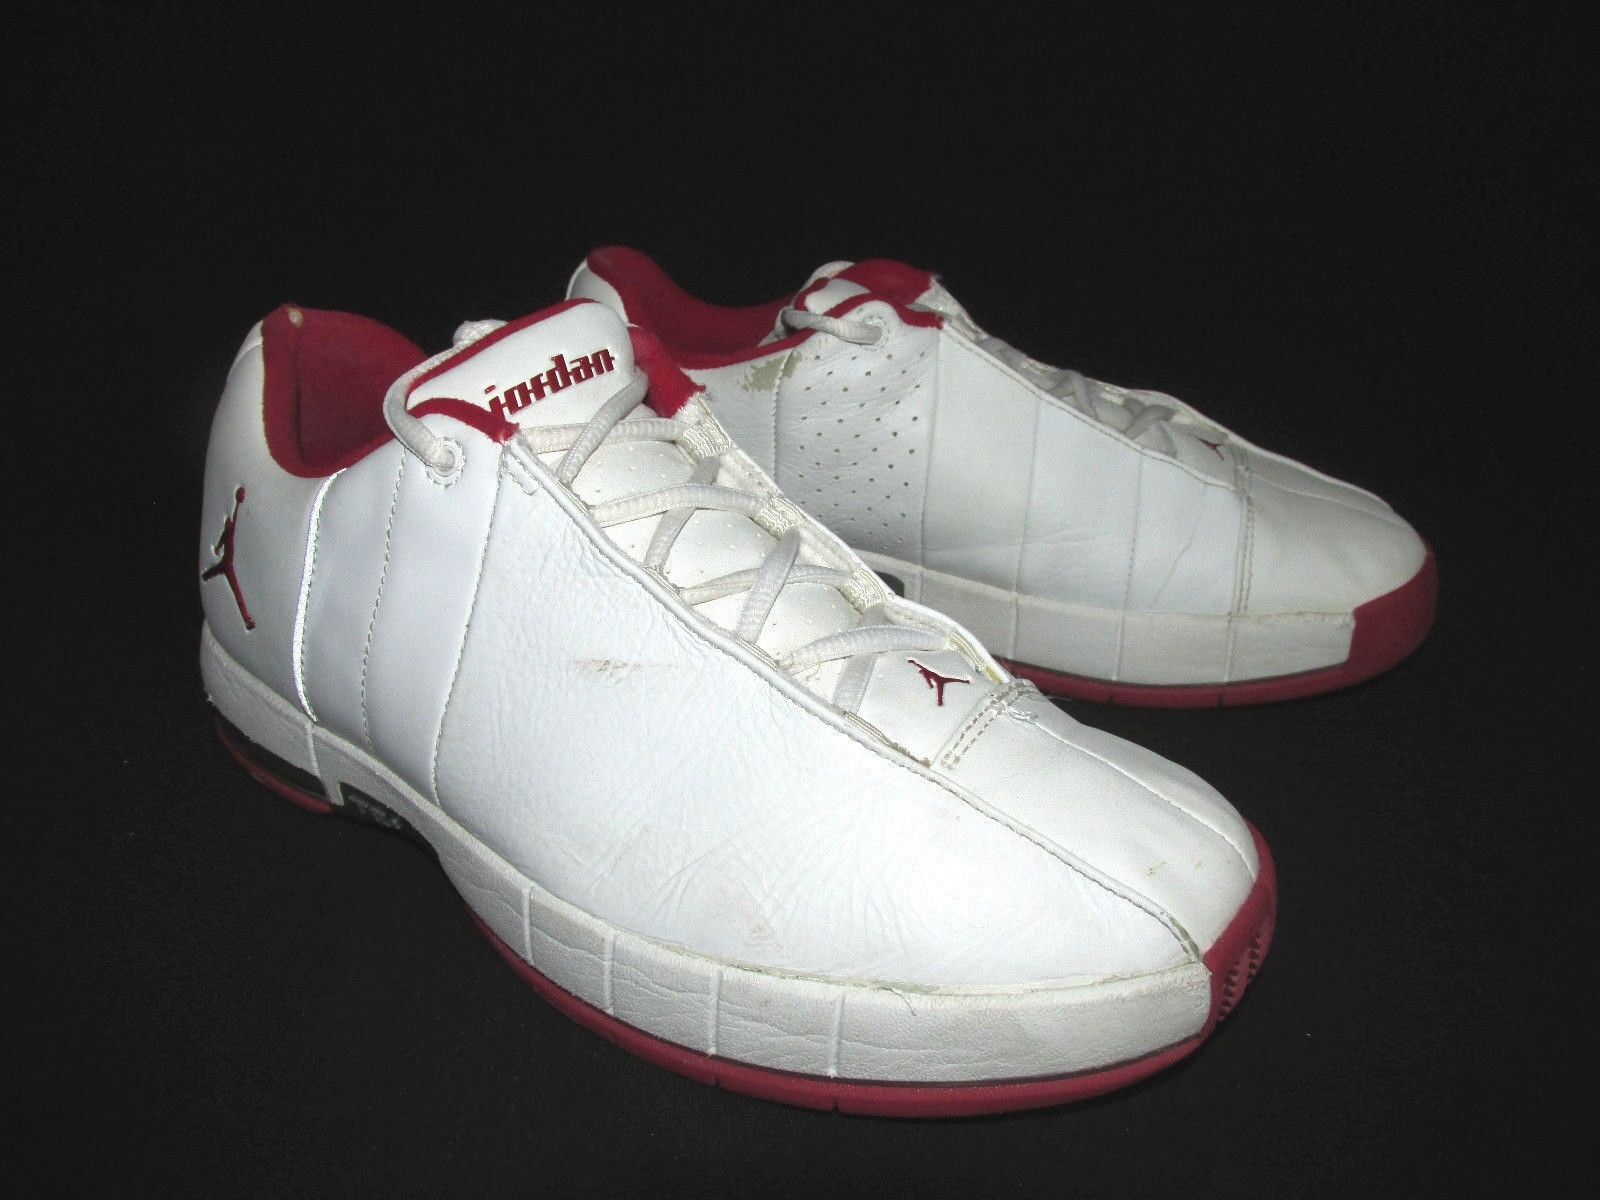 Nike Jordan 23 TE2 Advance Low White Leather Red Shoes  Men's  US 8M